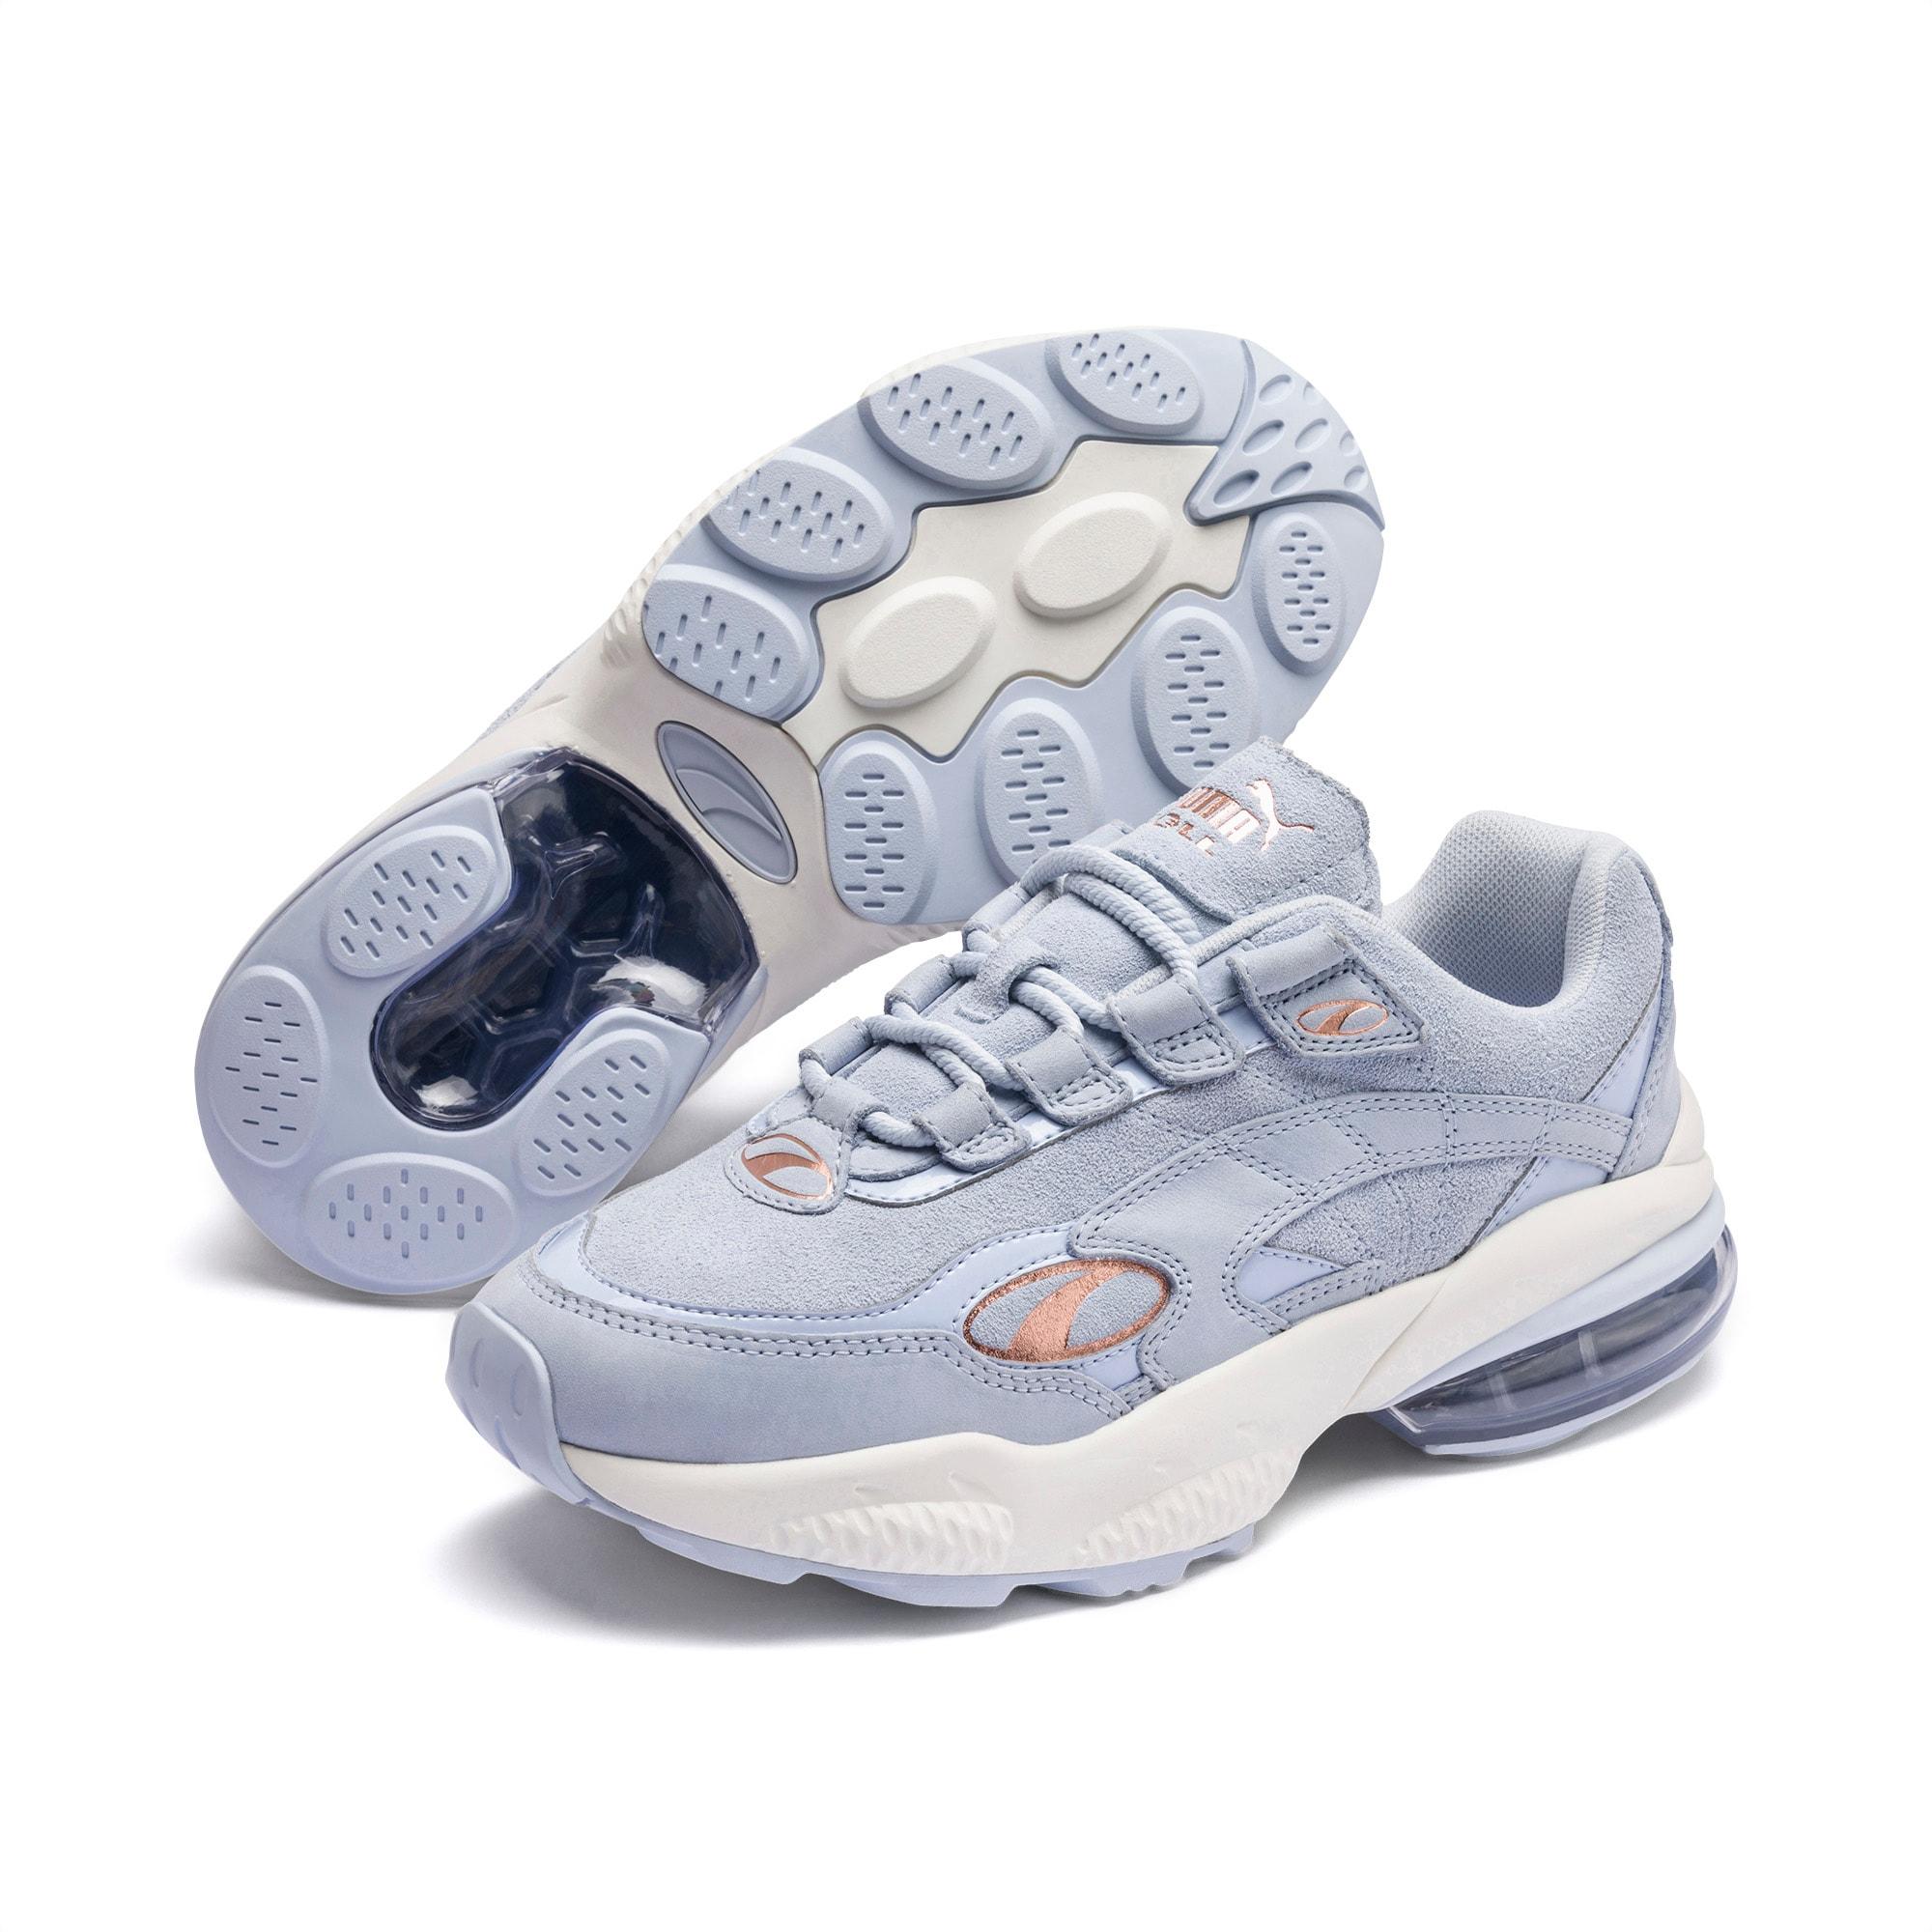 CELL Venom Patent Women's Sneakers